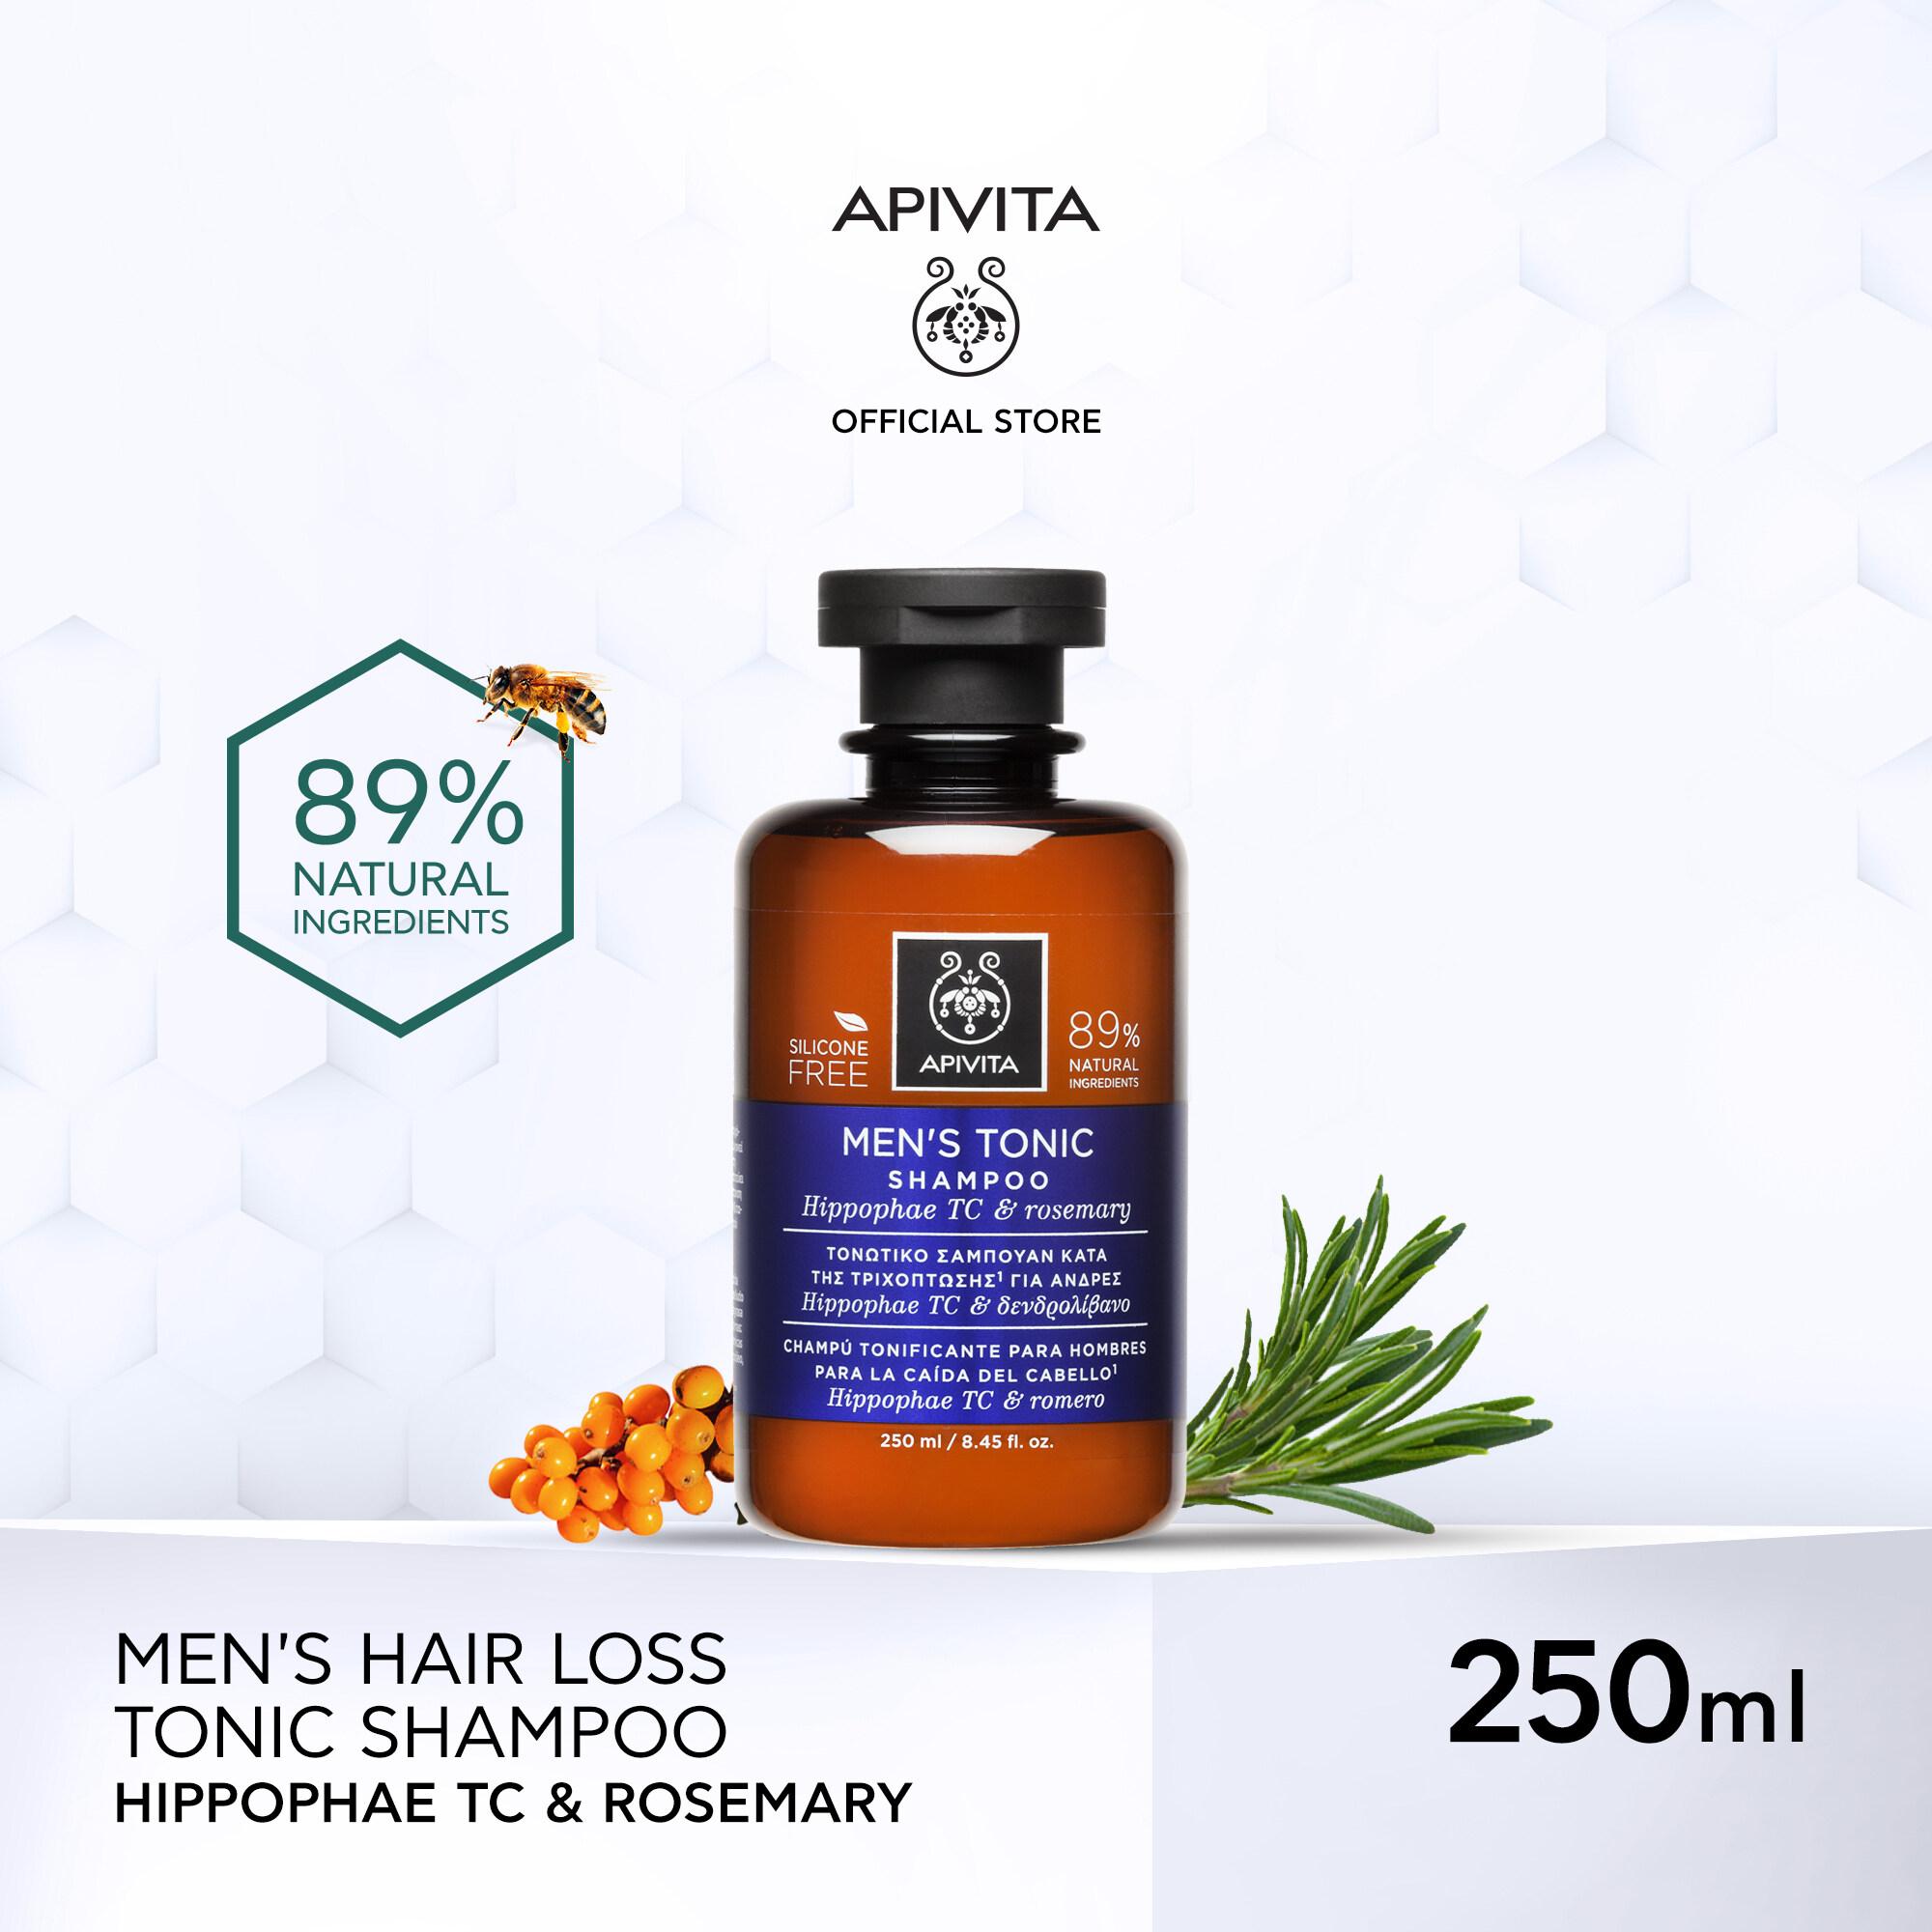 Apivita Mens Tonic Shampoo Hippophae Tc & Rosemary 250ml อะพิวิต้า เมน โทนิค แชมพู ฮิปโพรเพ ทีซี แอนด์ โรสแมรี่ 250 มล..